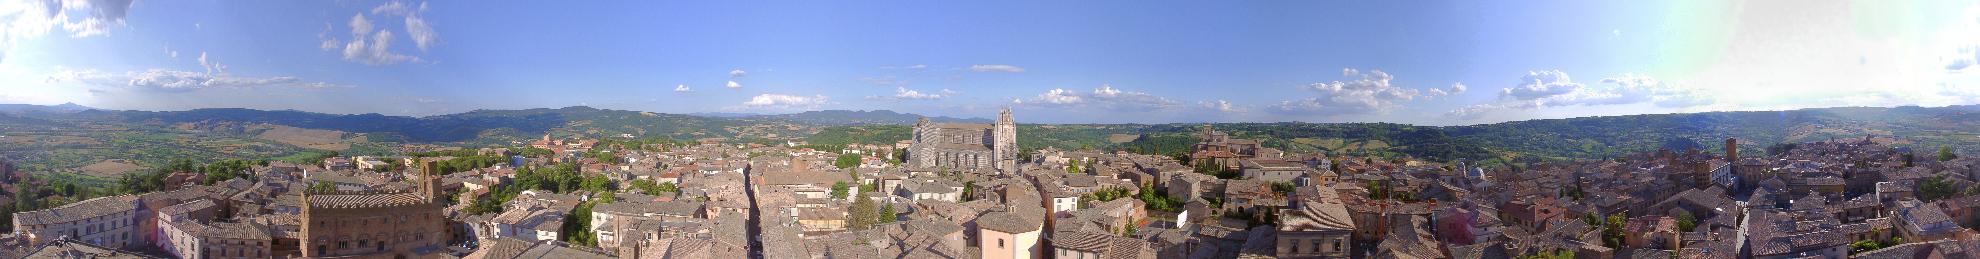 Orvieto -Rundblick vom Torre del Moro